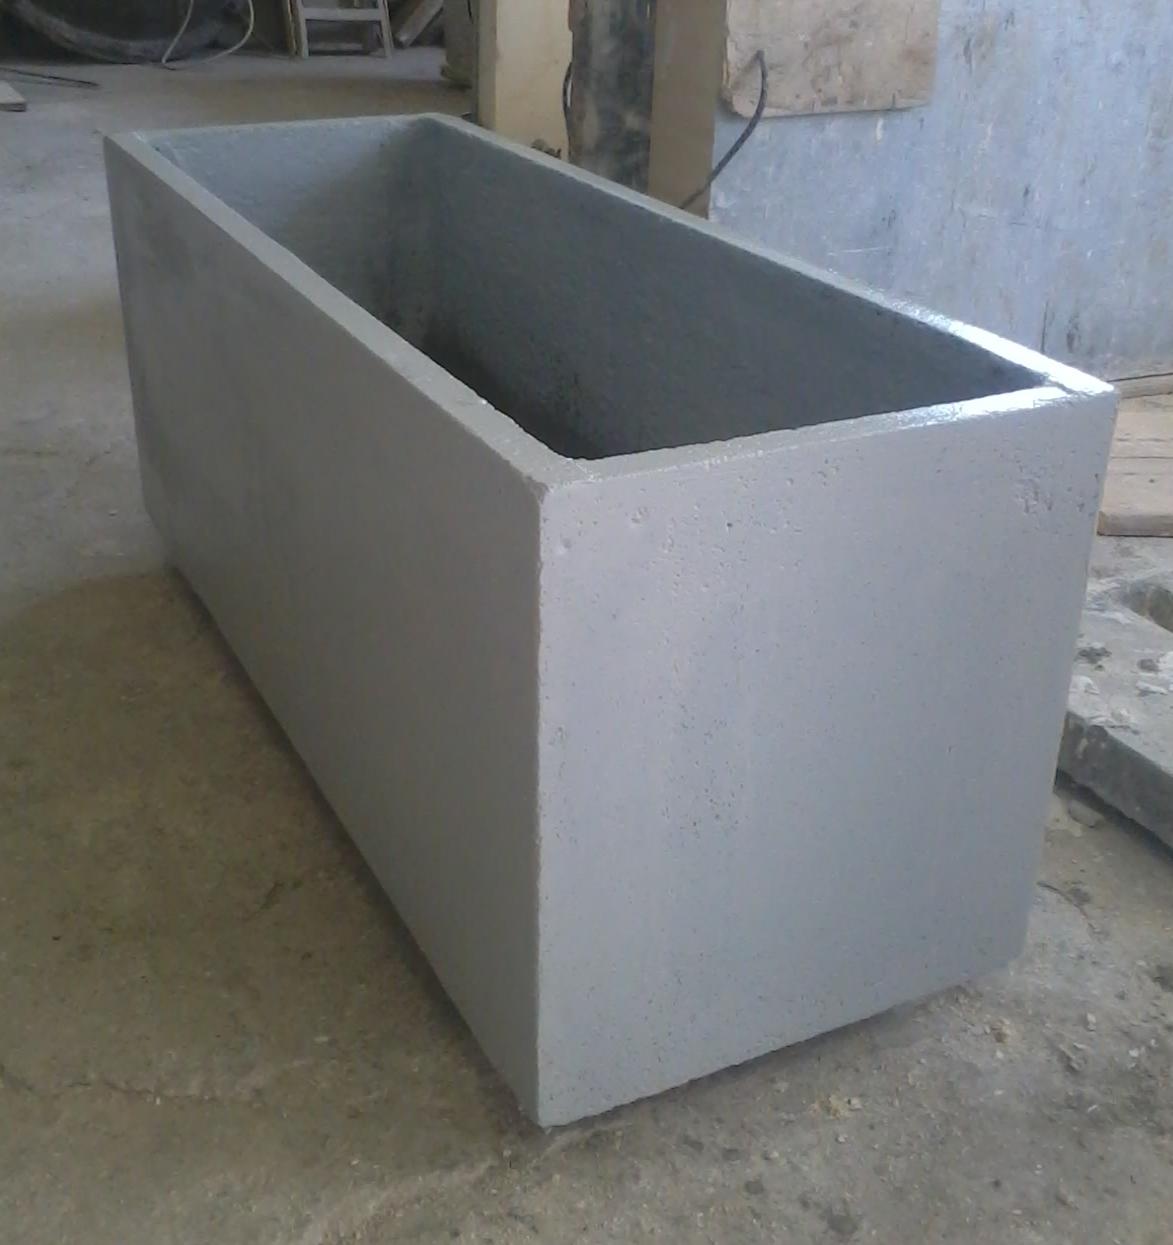 Vasi in cemento a roma vasi in cemento - Vasi per esterno in cemento ...